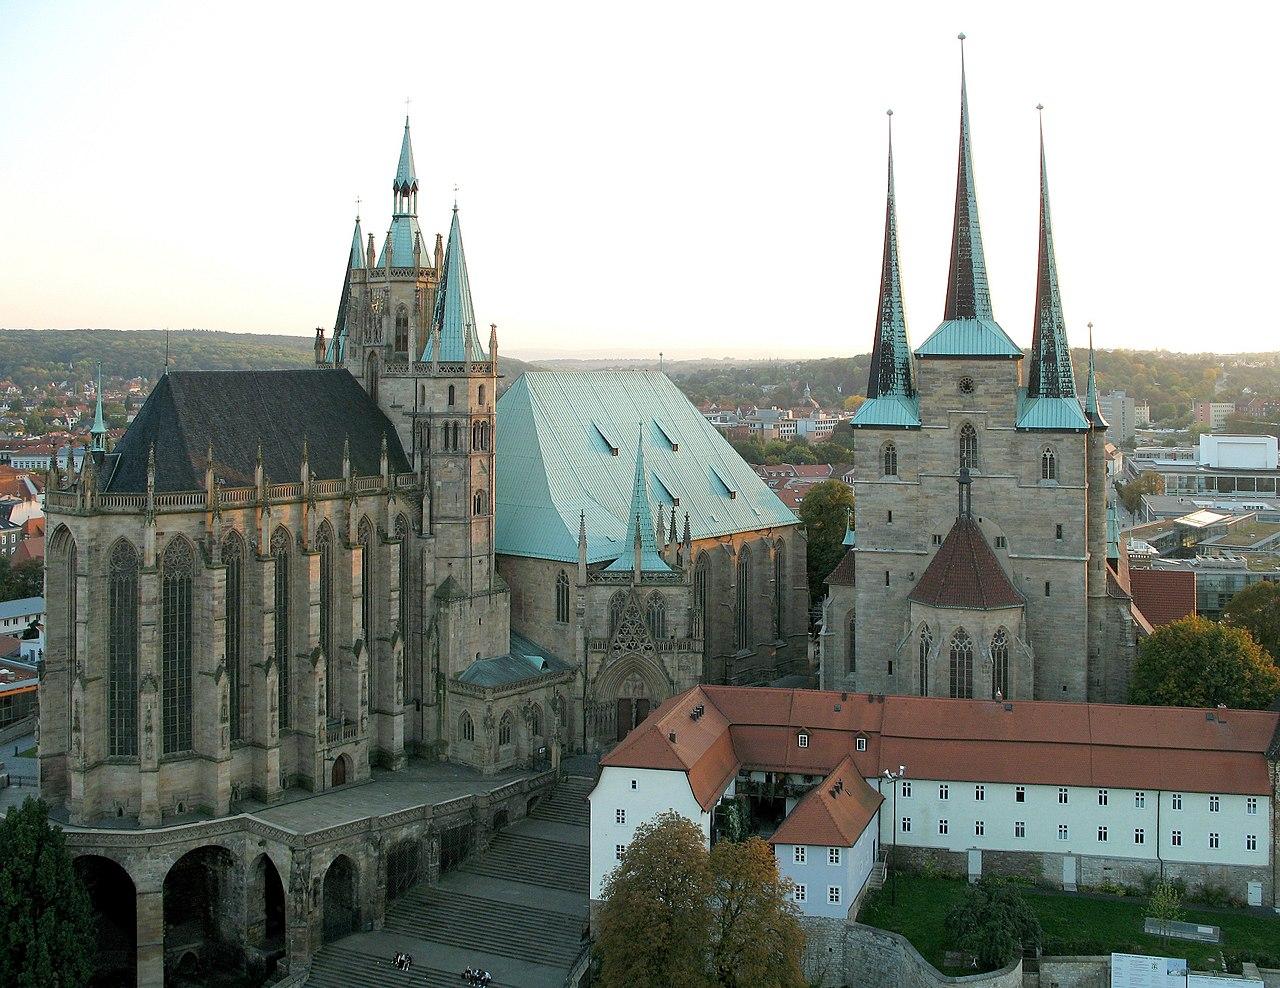 1280px-Erfurt_cathedral_and_severi_church-2.jpg